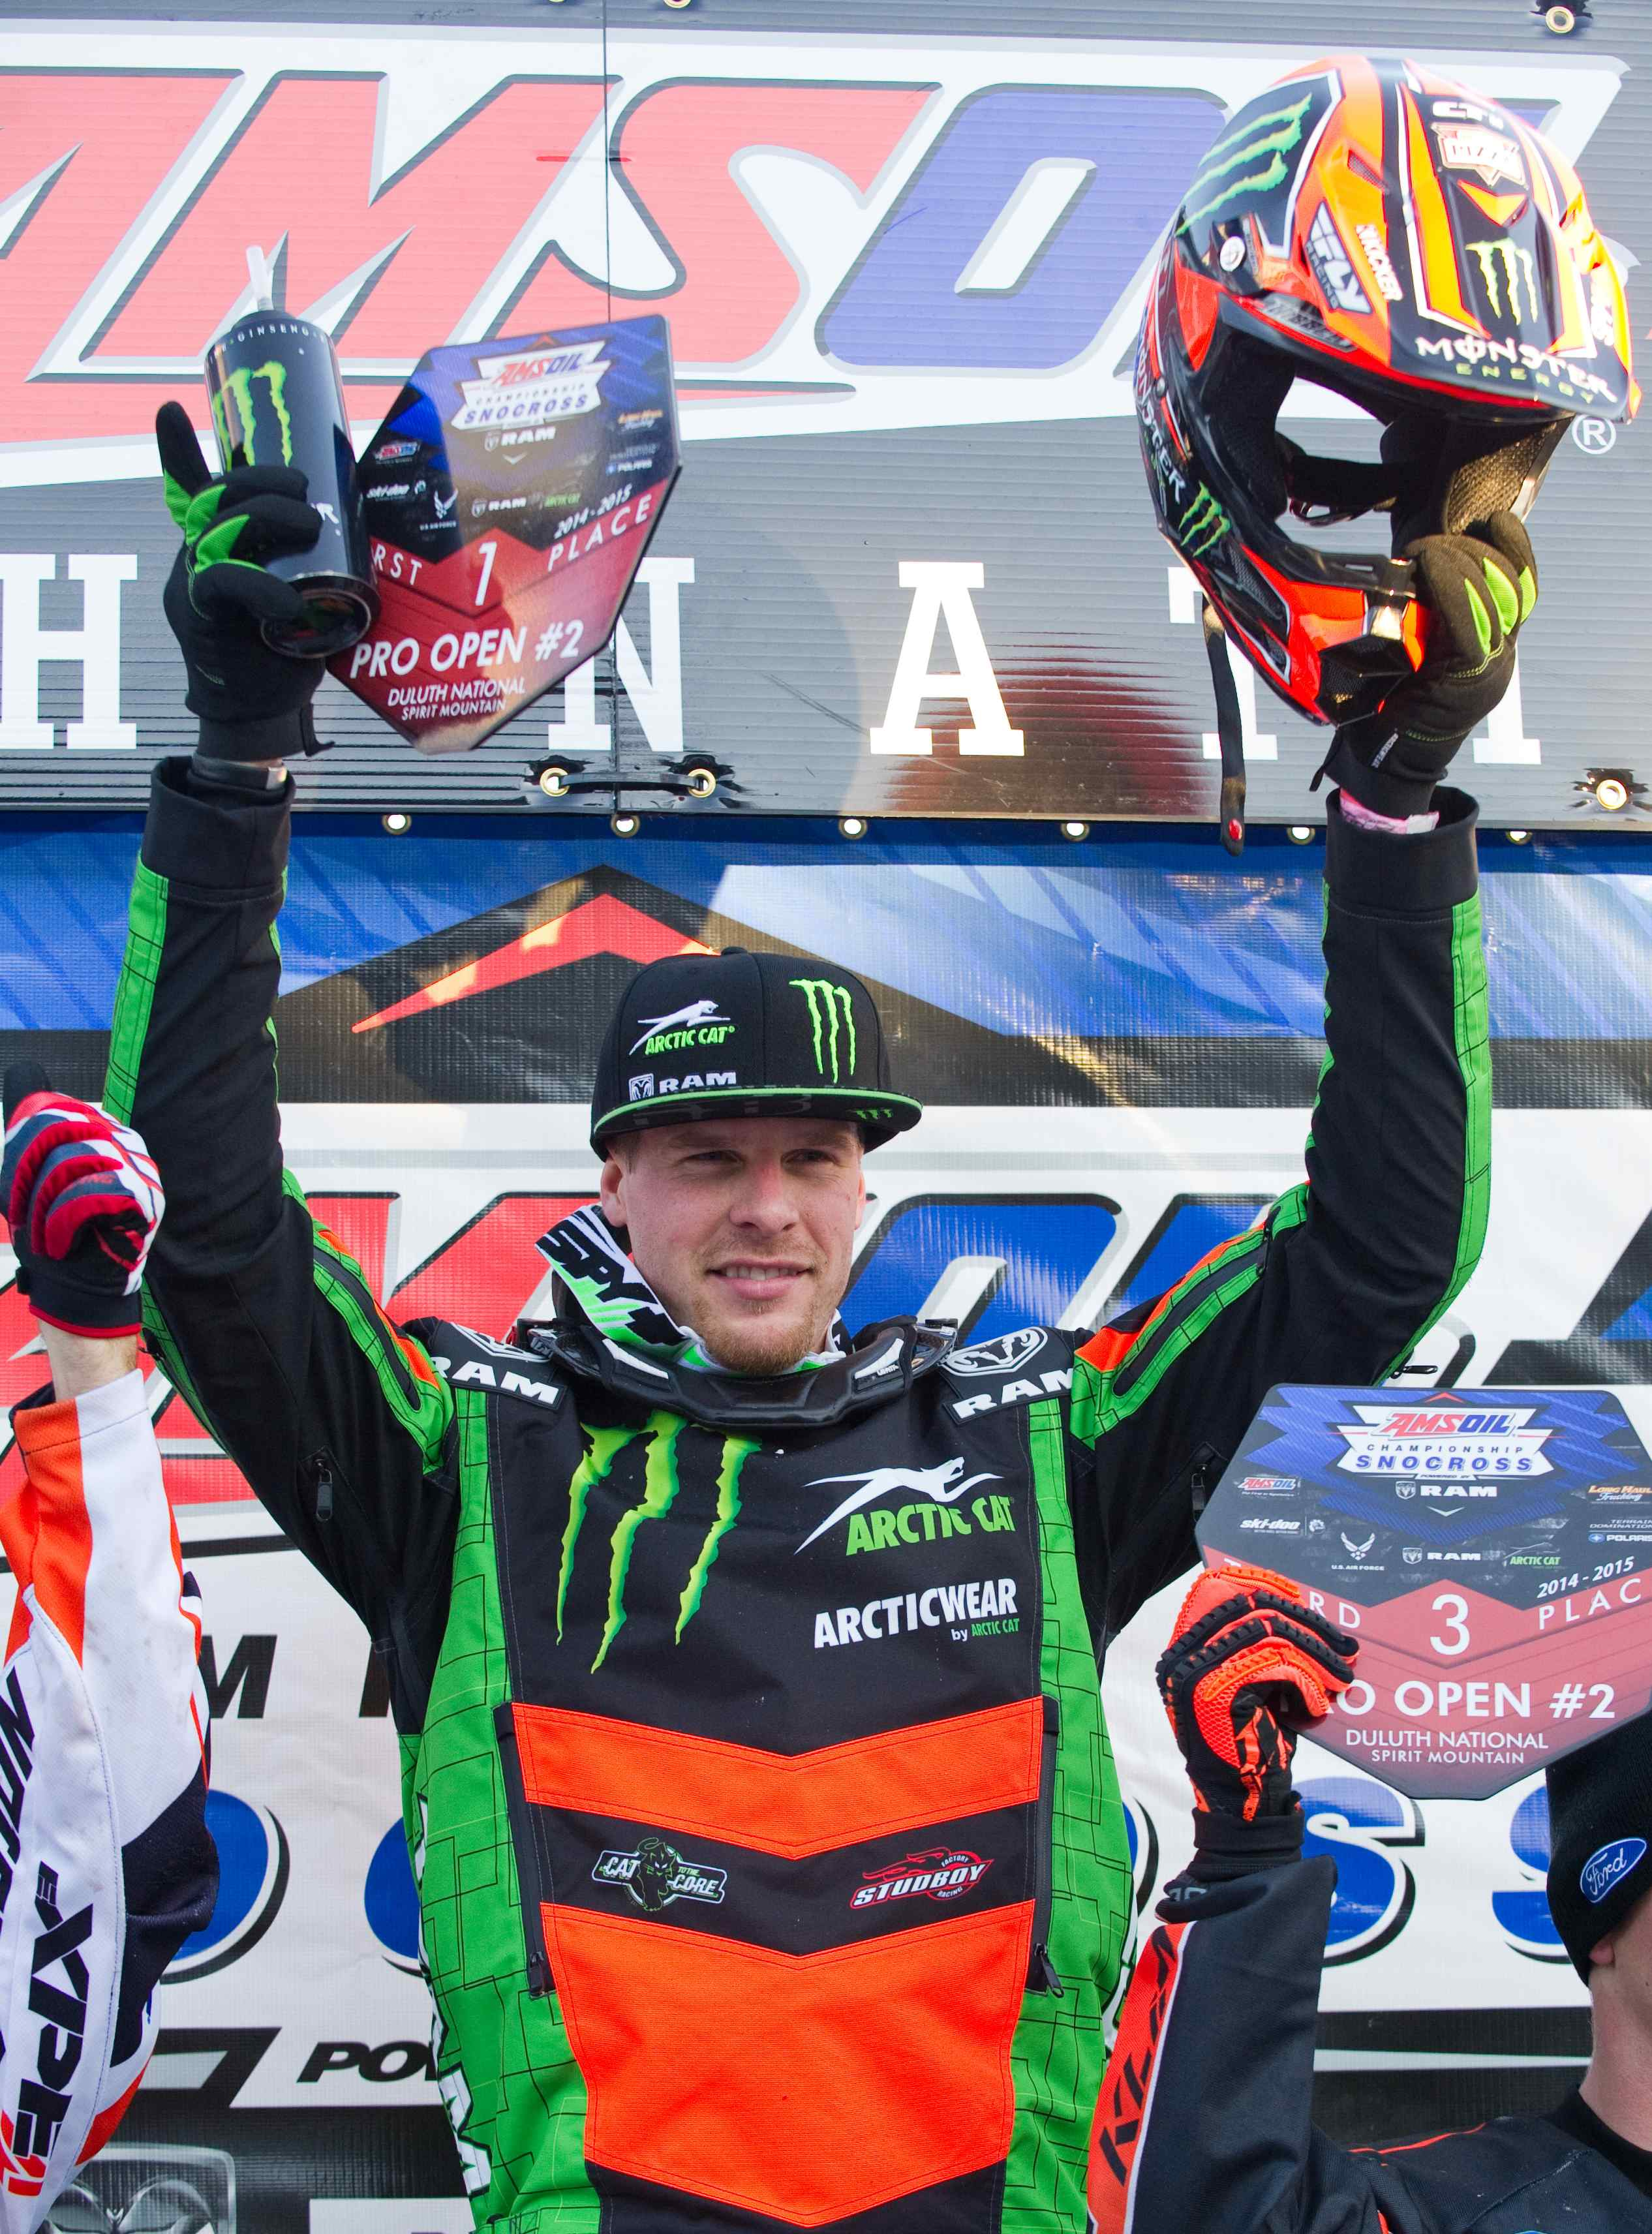 Tucker Hibbert returns to winning ways at Duluth Snocross National